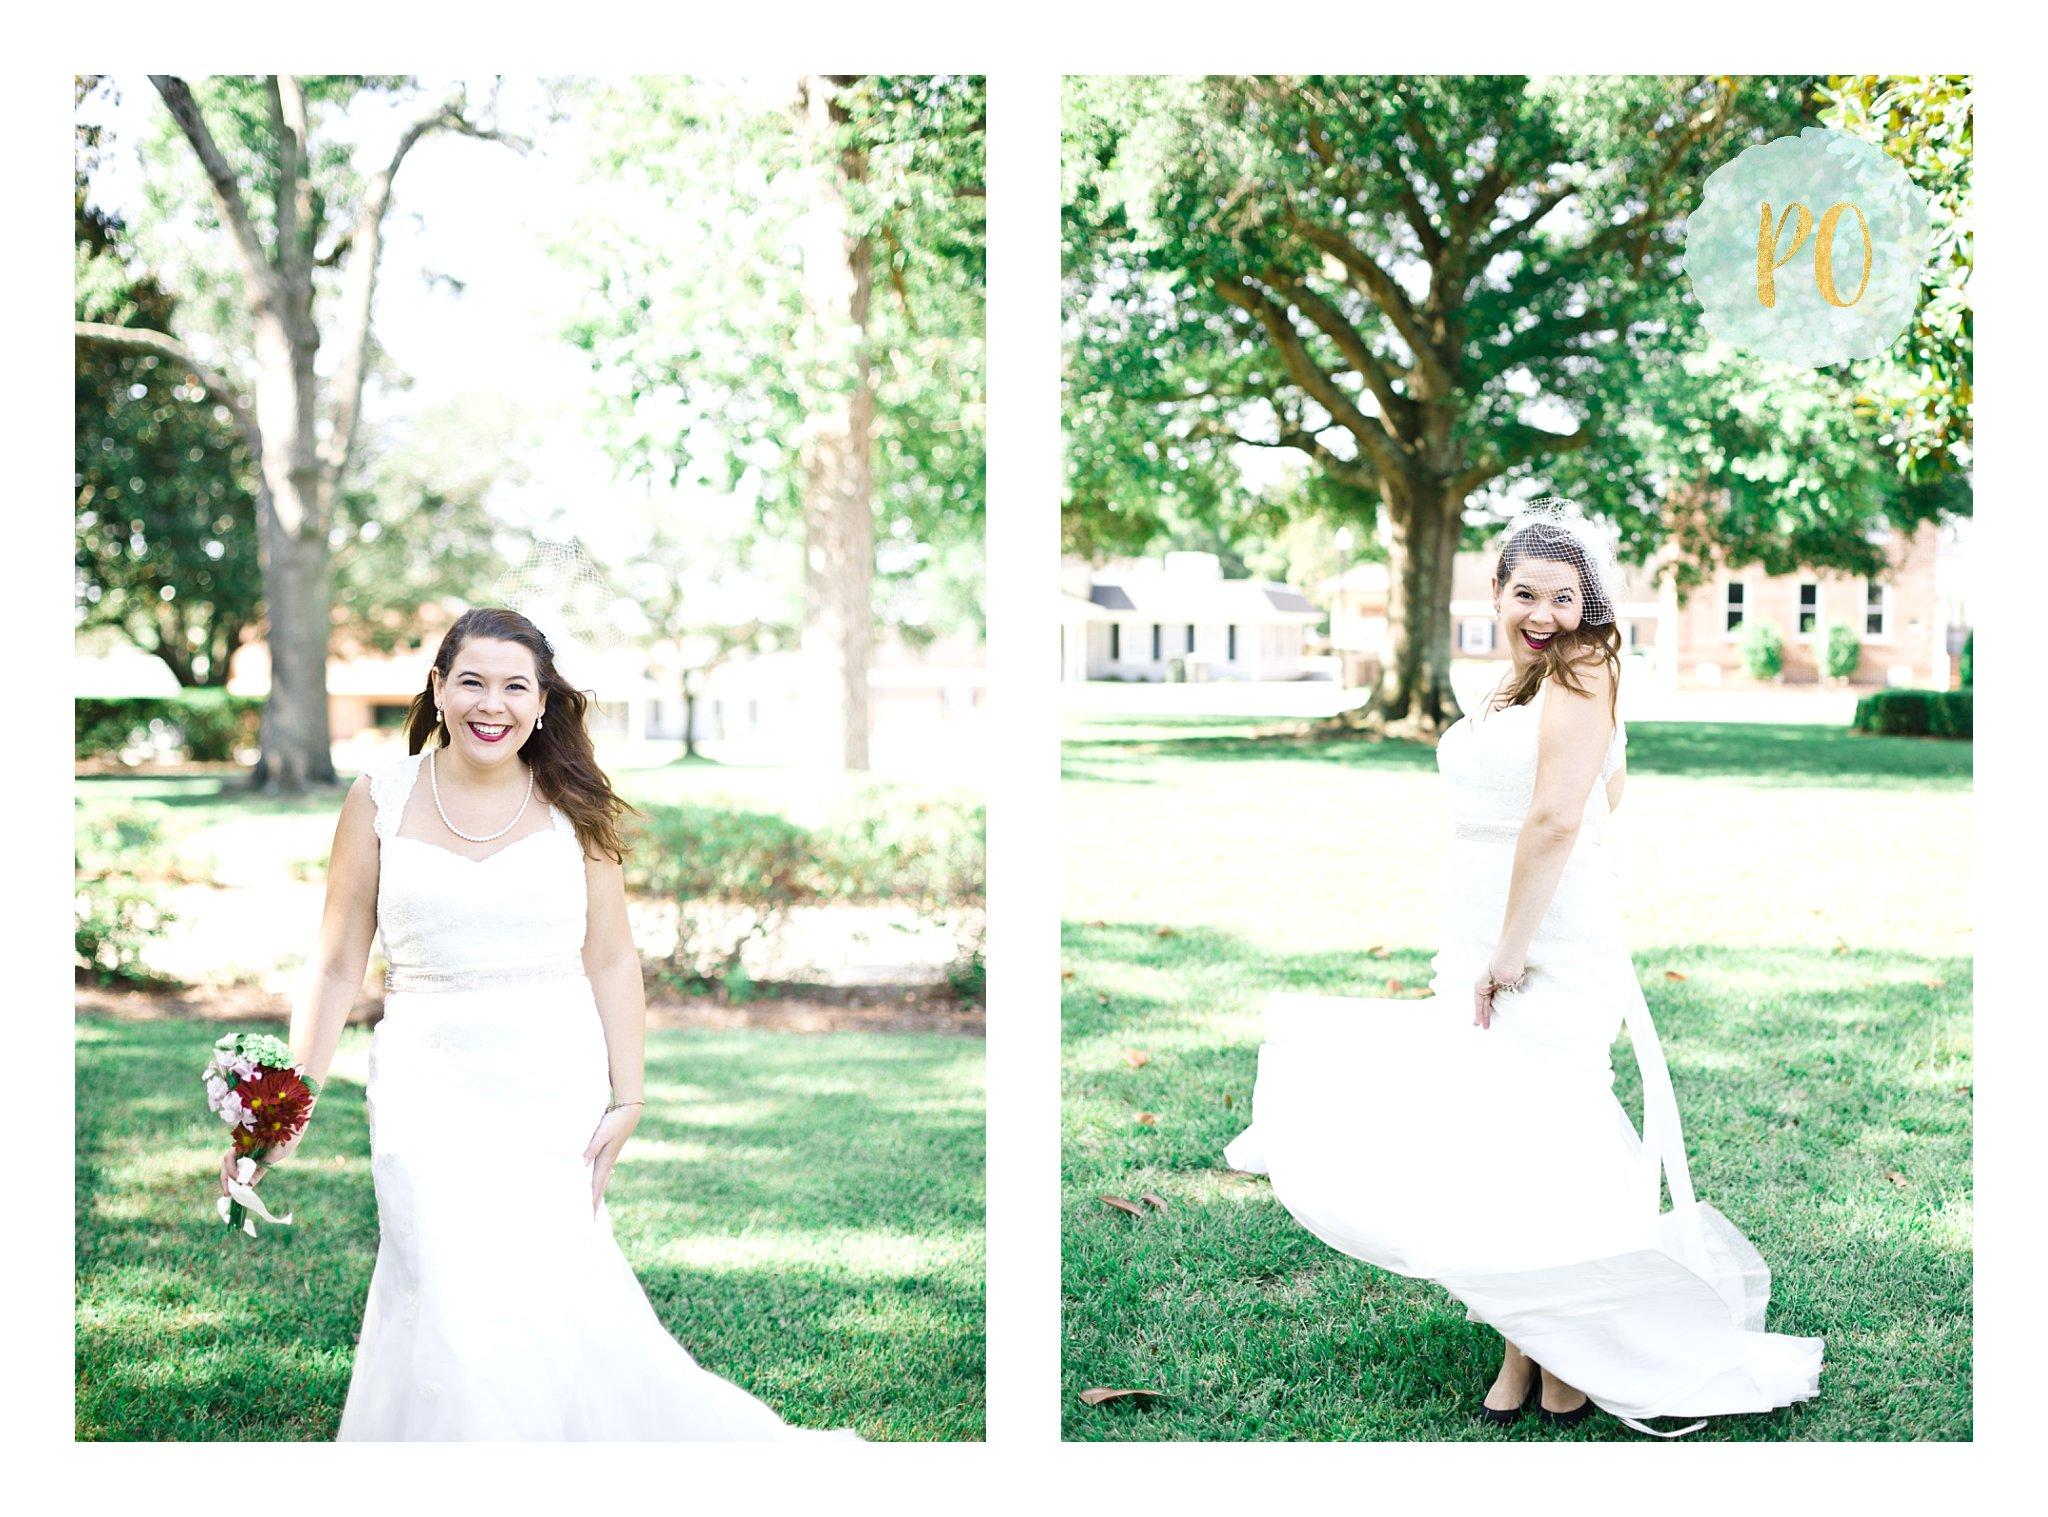 cypress-inn-lowcountry-bridal-session-conway-sc-photos_0144.jpg